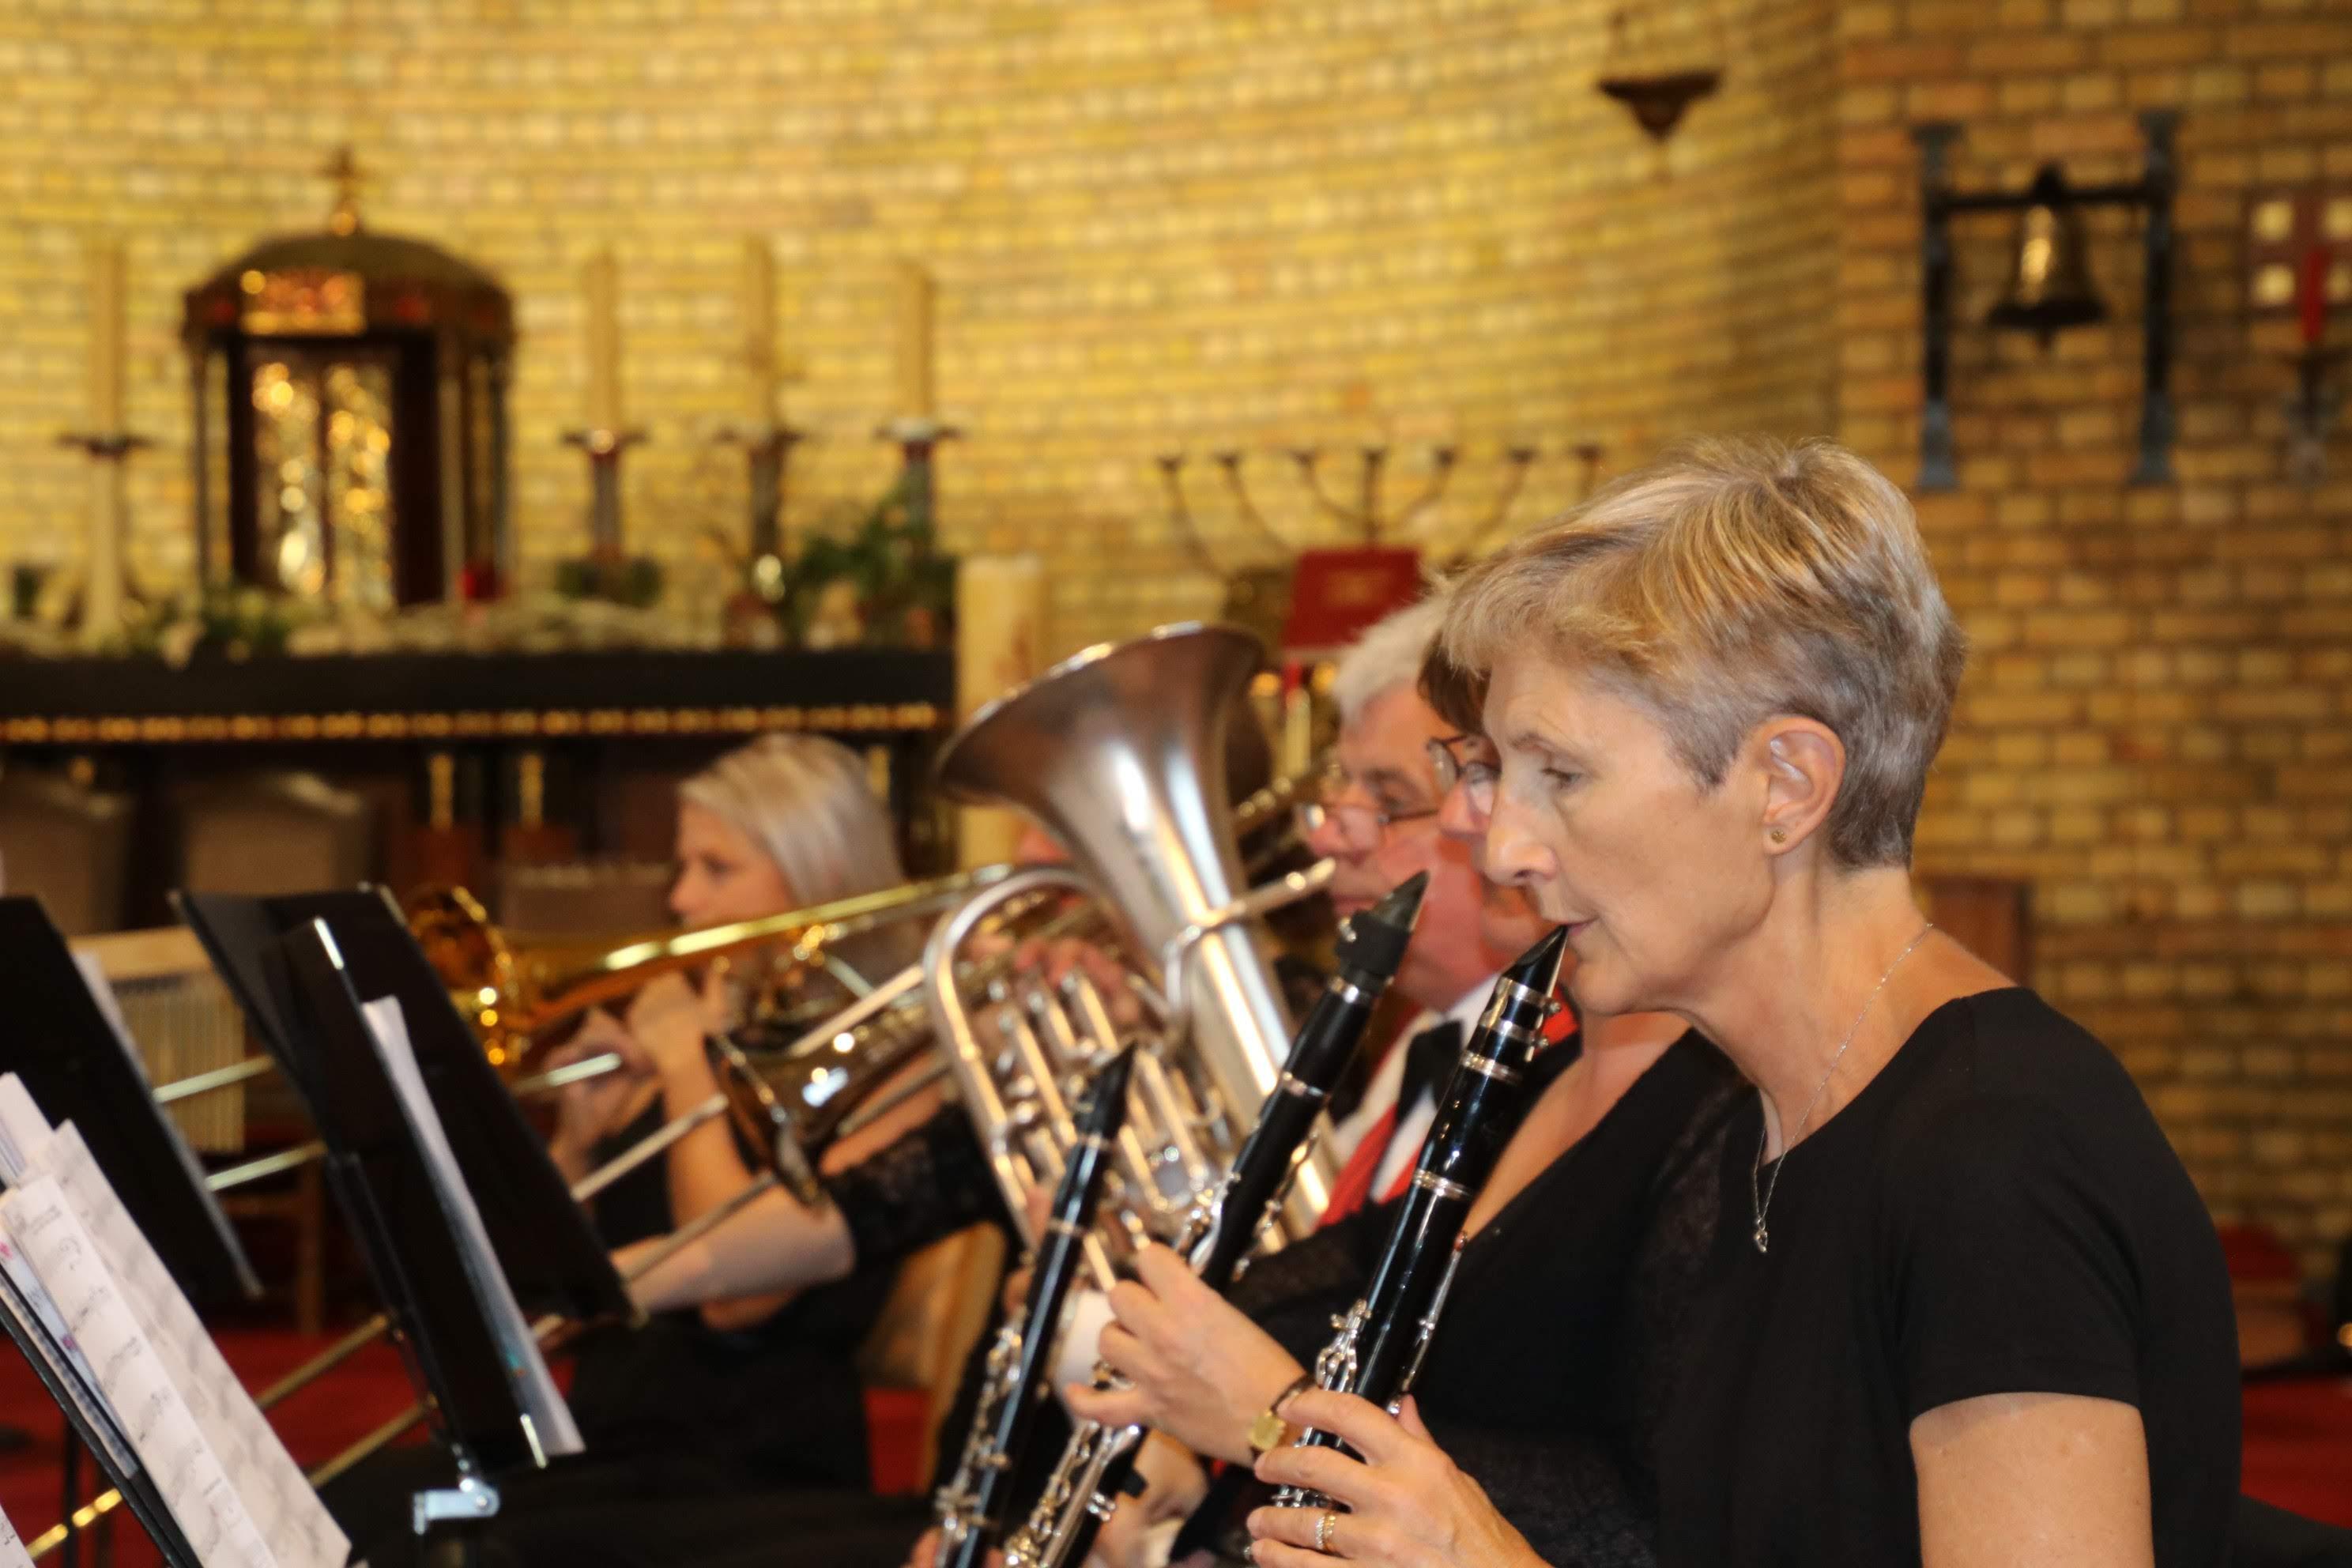 IMG_1170-De-Panne-3rd-clarinets